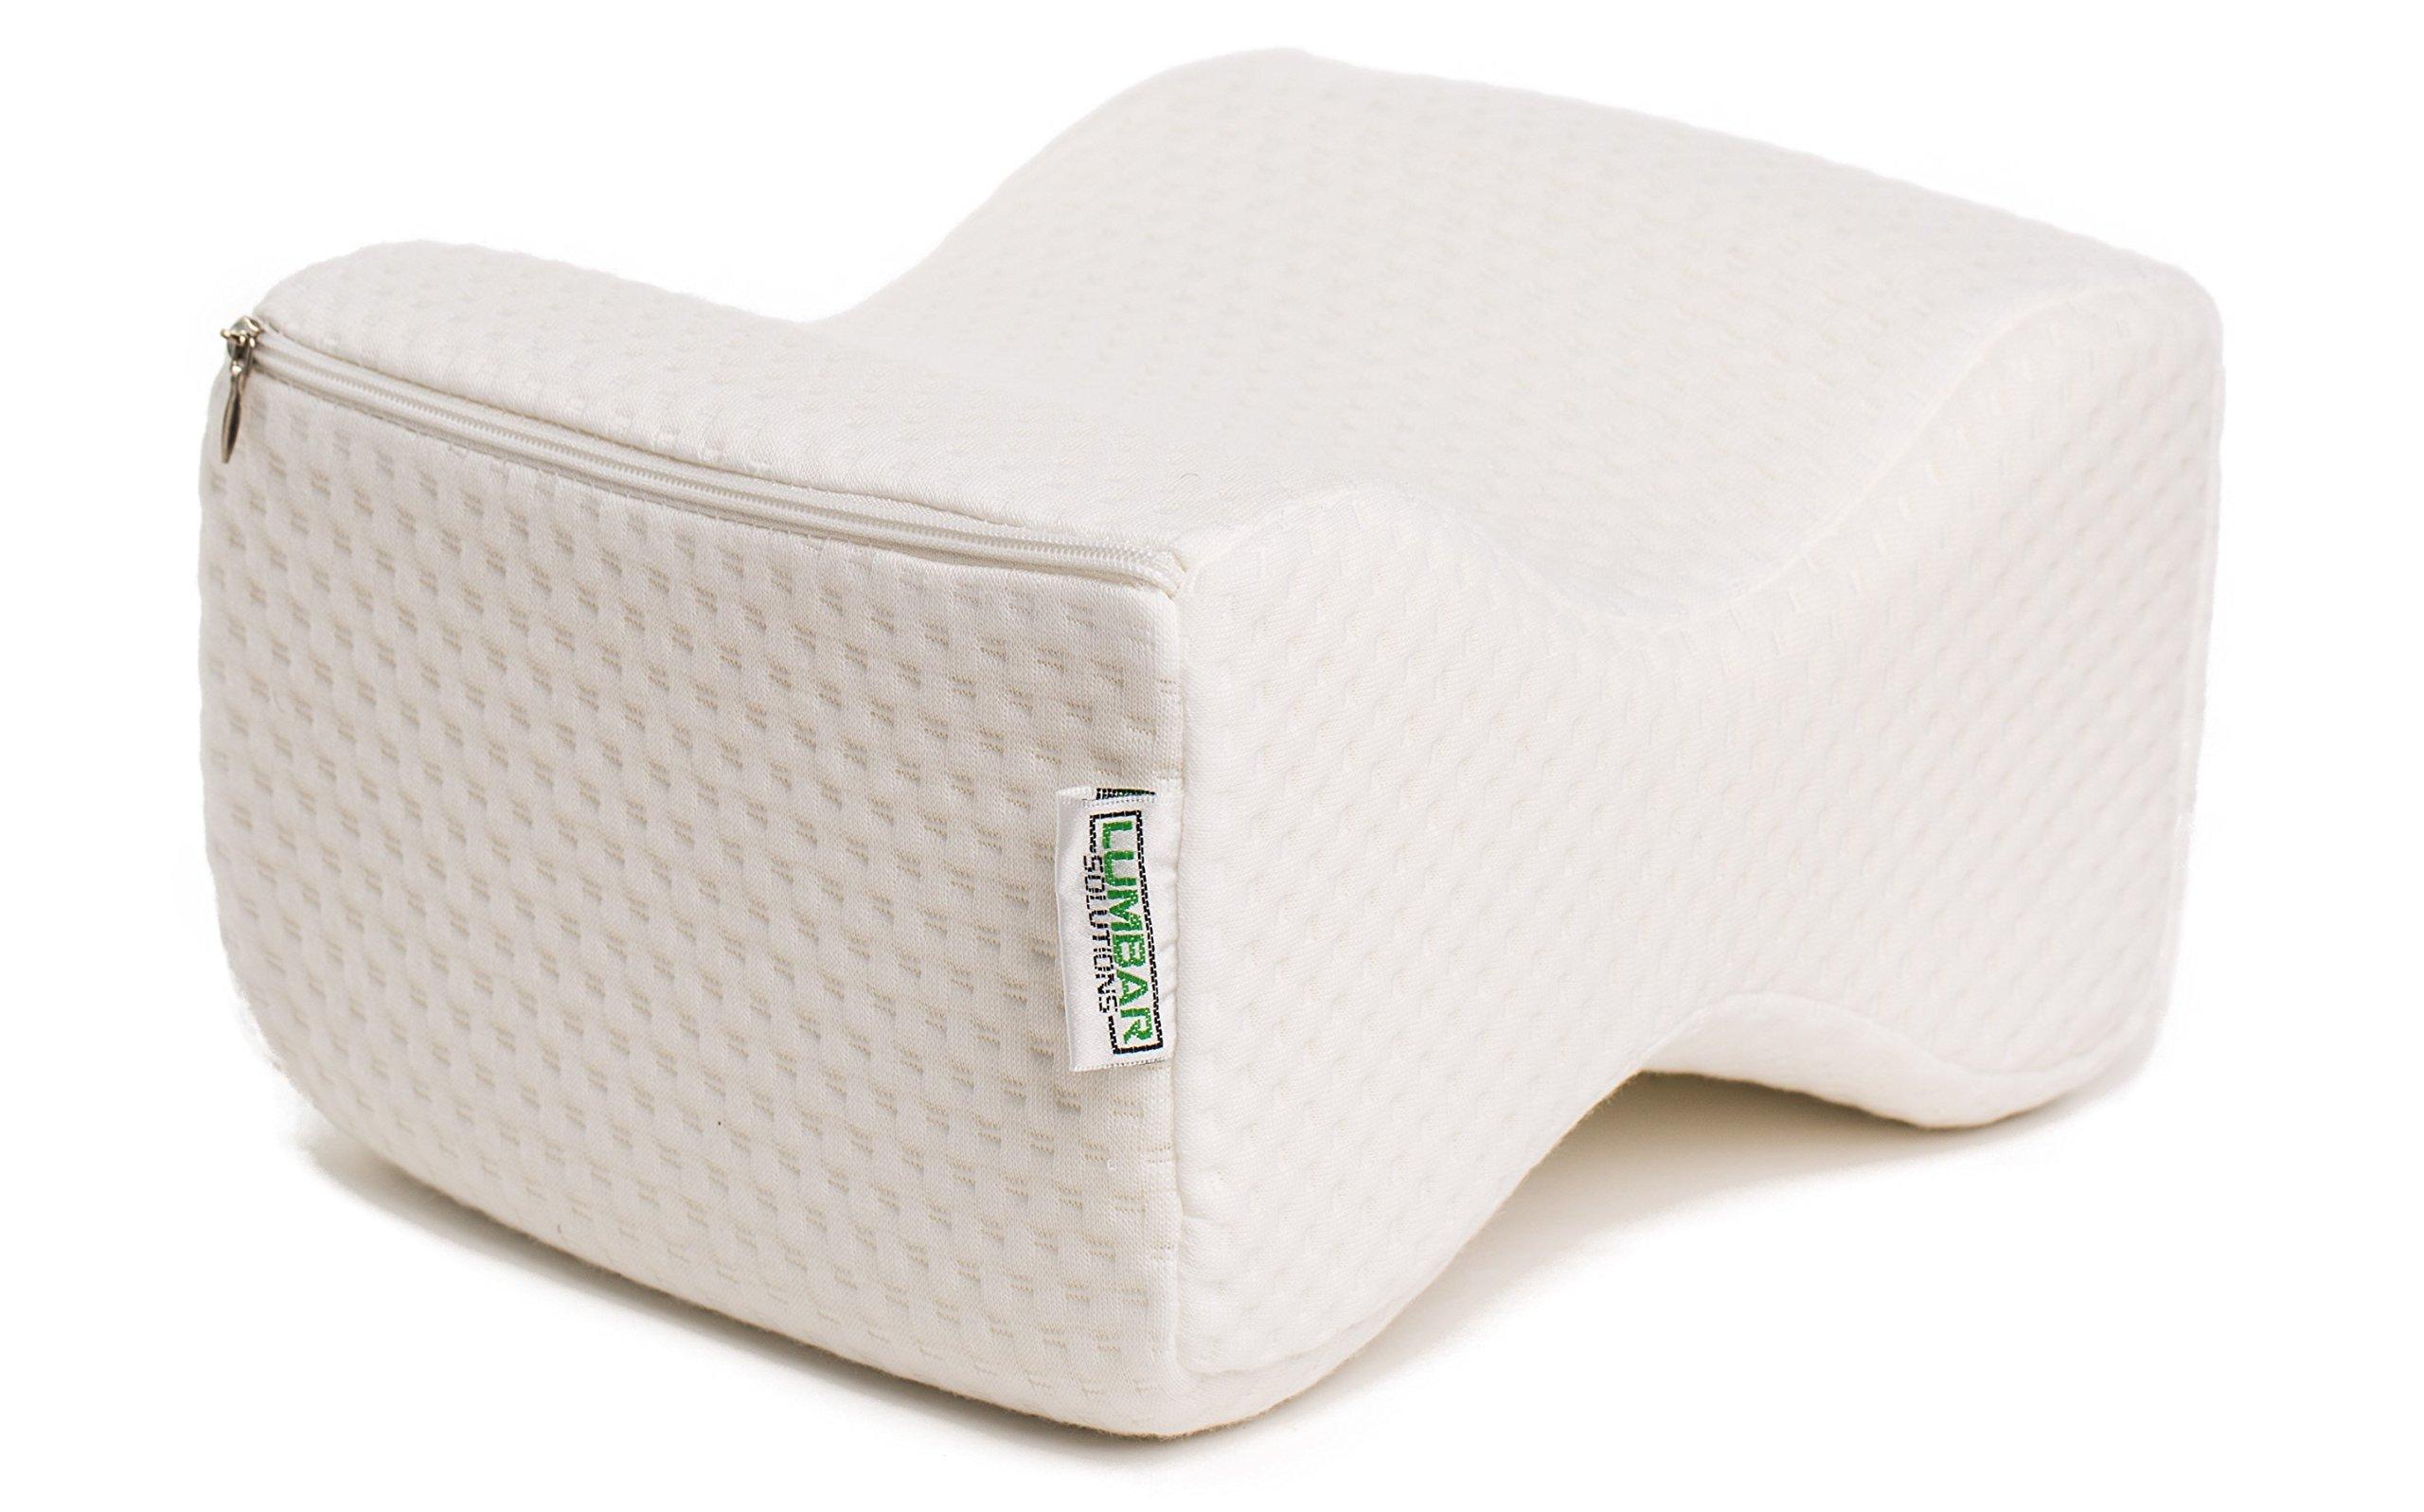 Lumbar Solutions Memory Foam Knee Pillow - Bonus: Includes free extra cover!!!